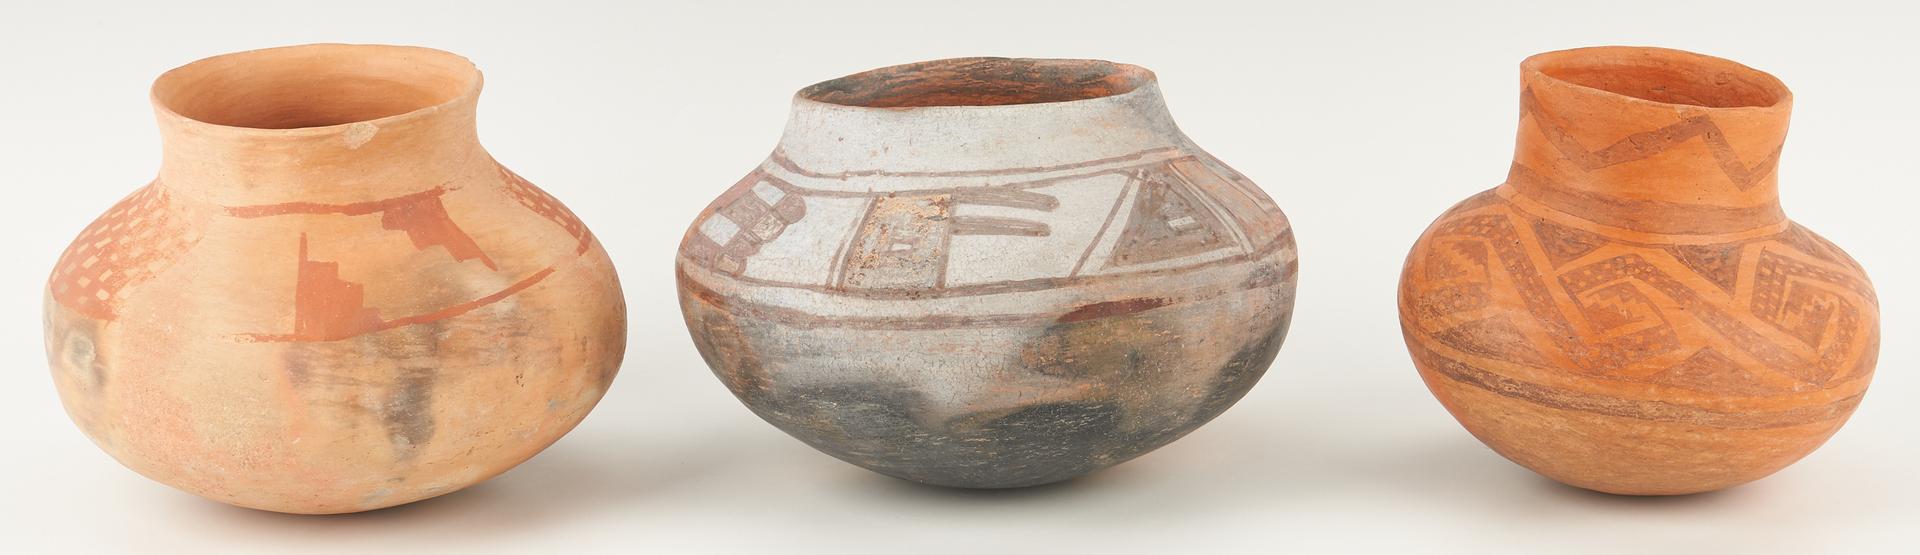 Lot 1113: 3 Native American Anasazi Pottery Ollas